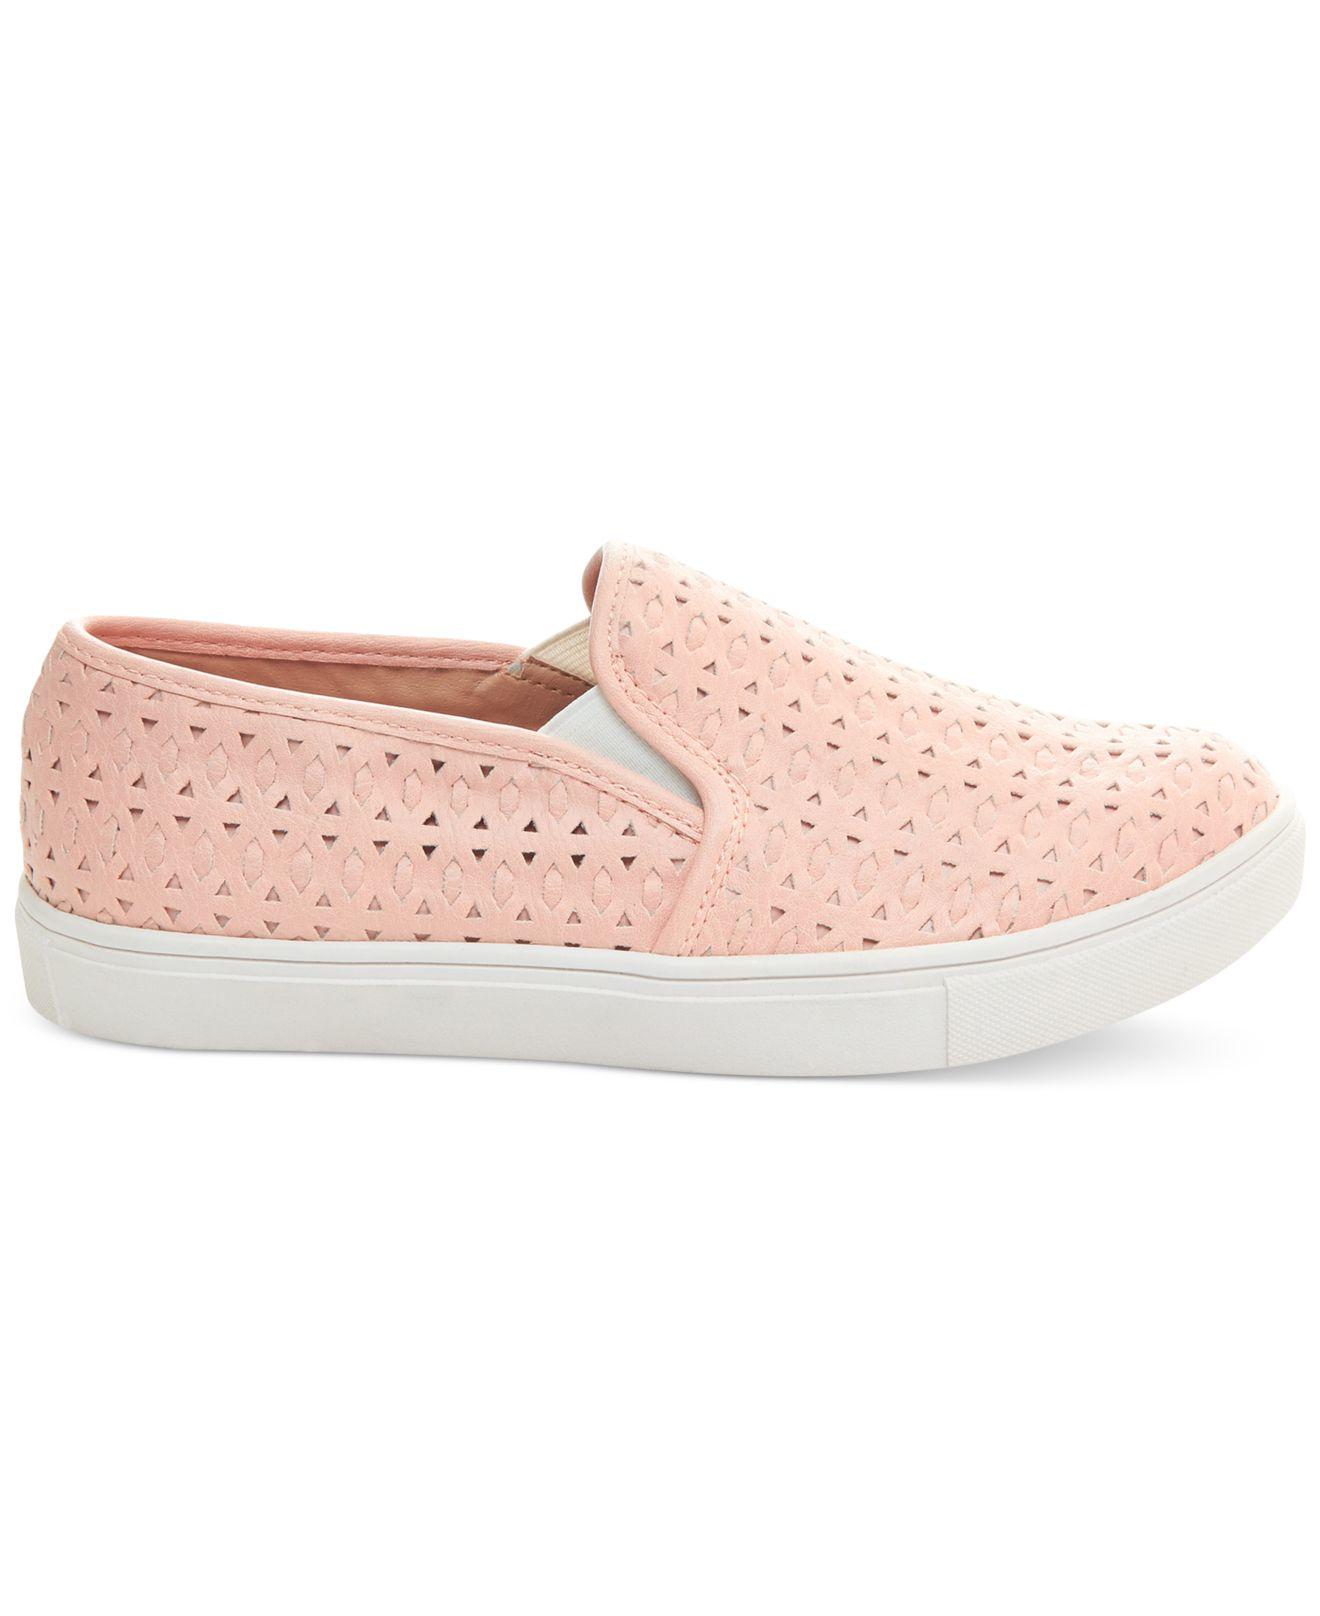 steve madden s excel slip on sneakers in pink lyst